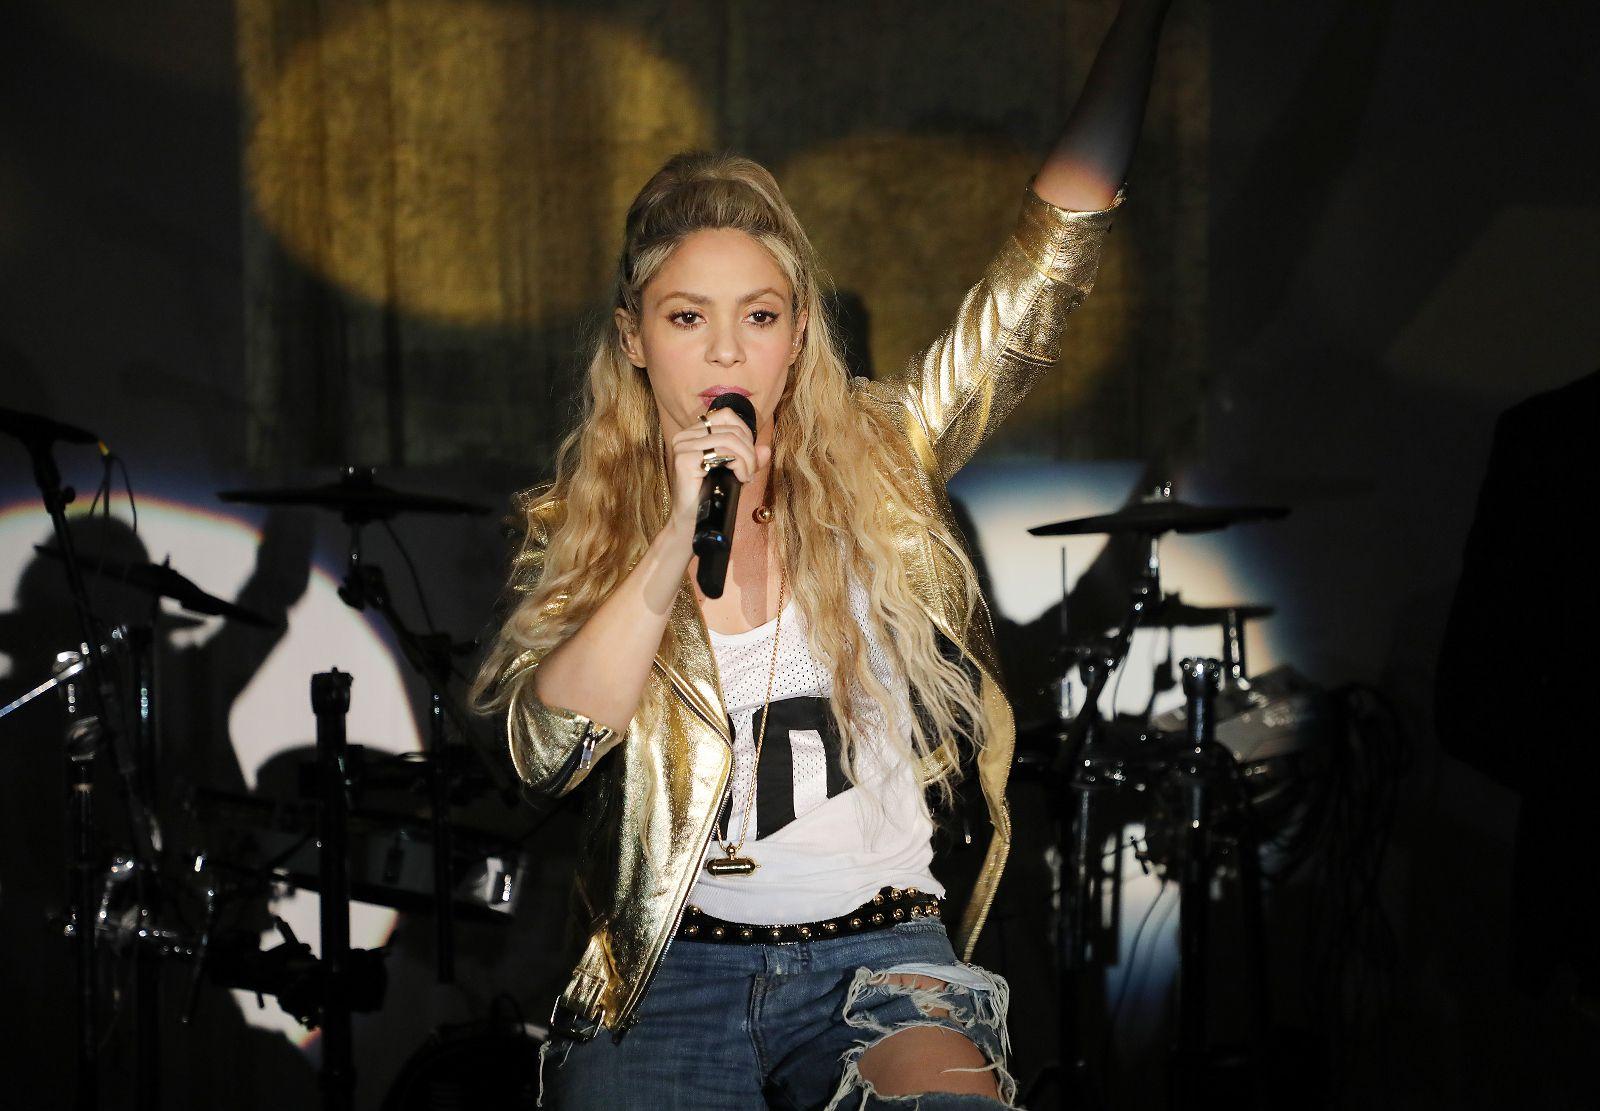 The Top 20 Shakira Songs